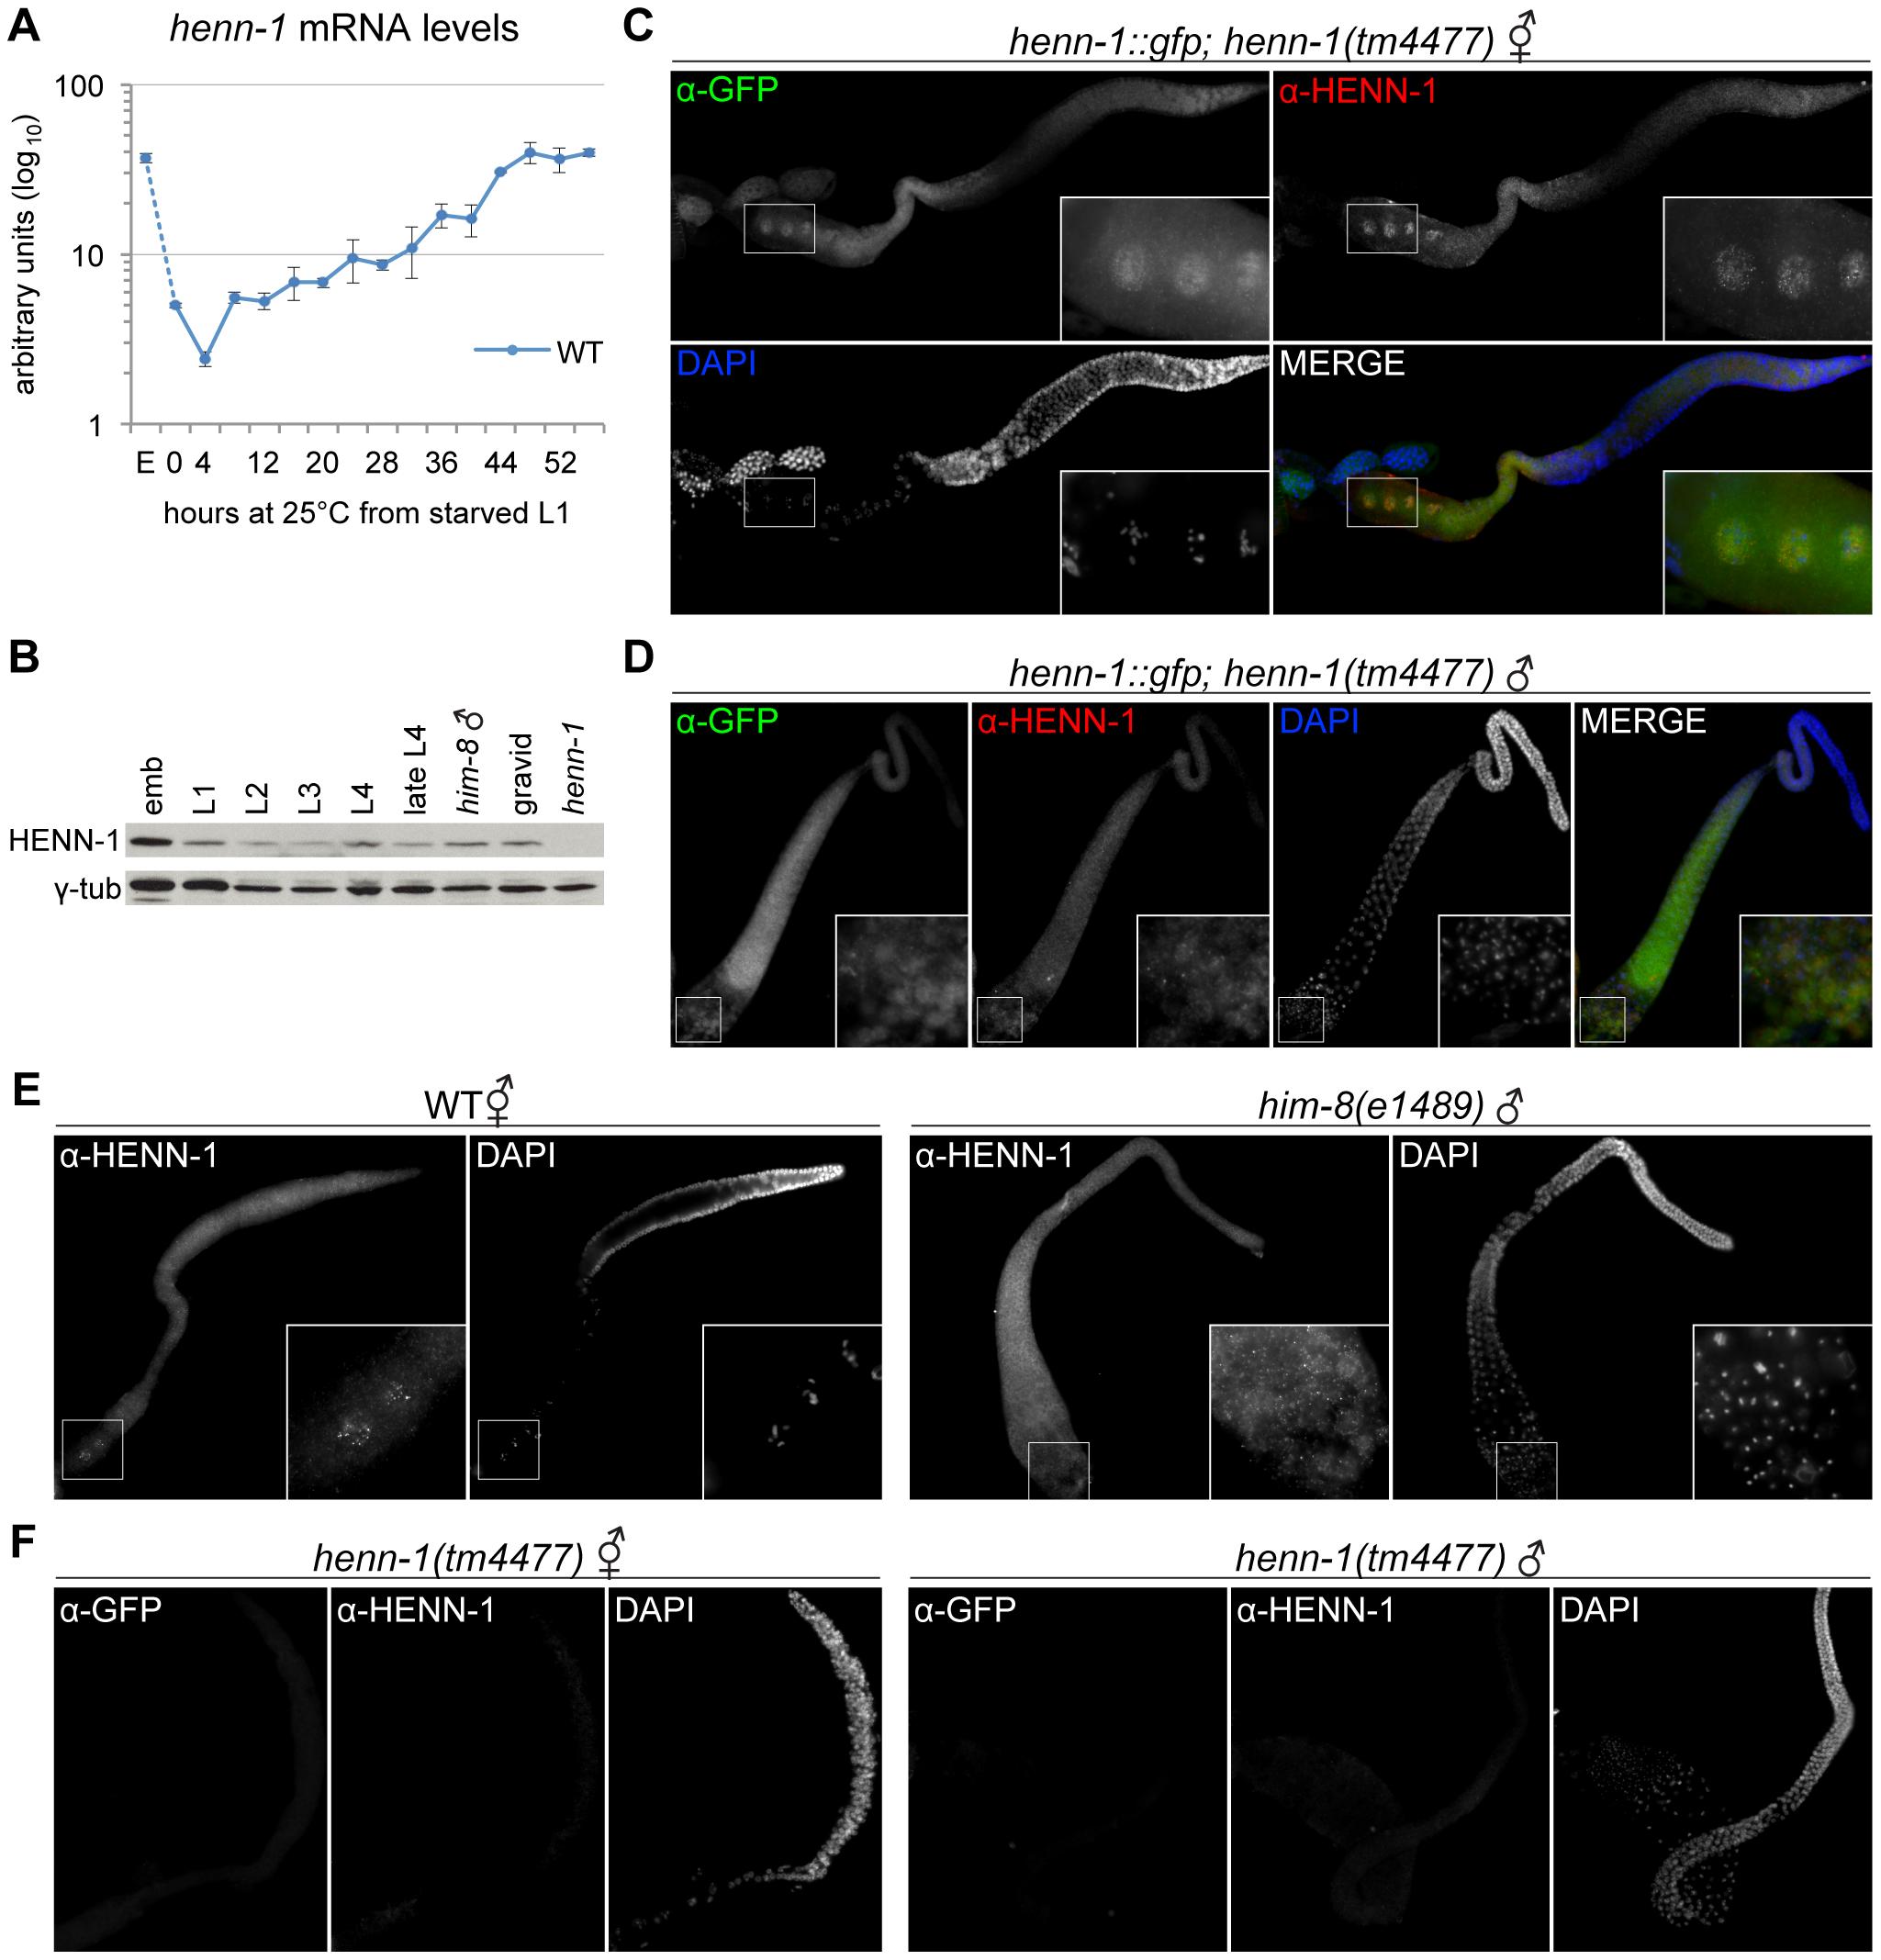 HENN-1 Is Broadly Expressed in <i>C. elegans</i> Germline.